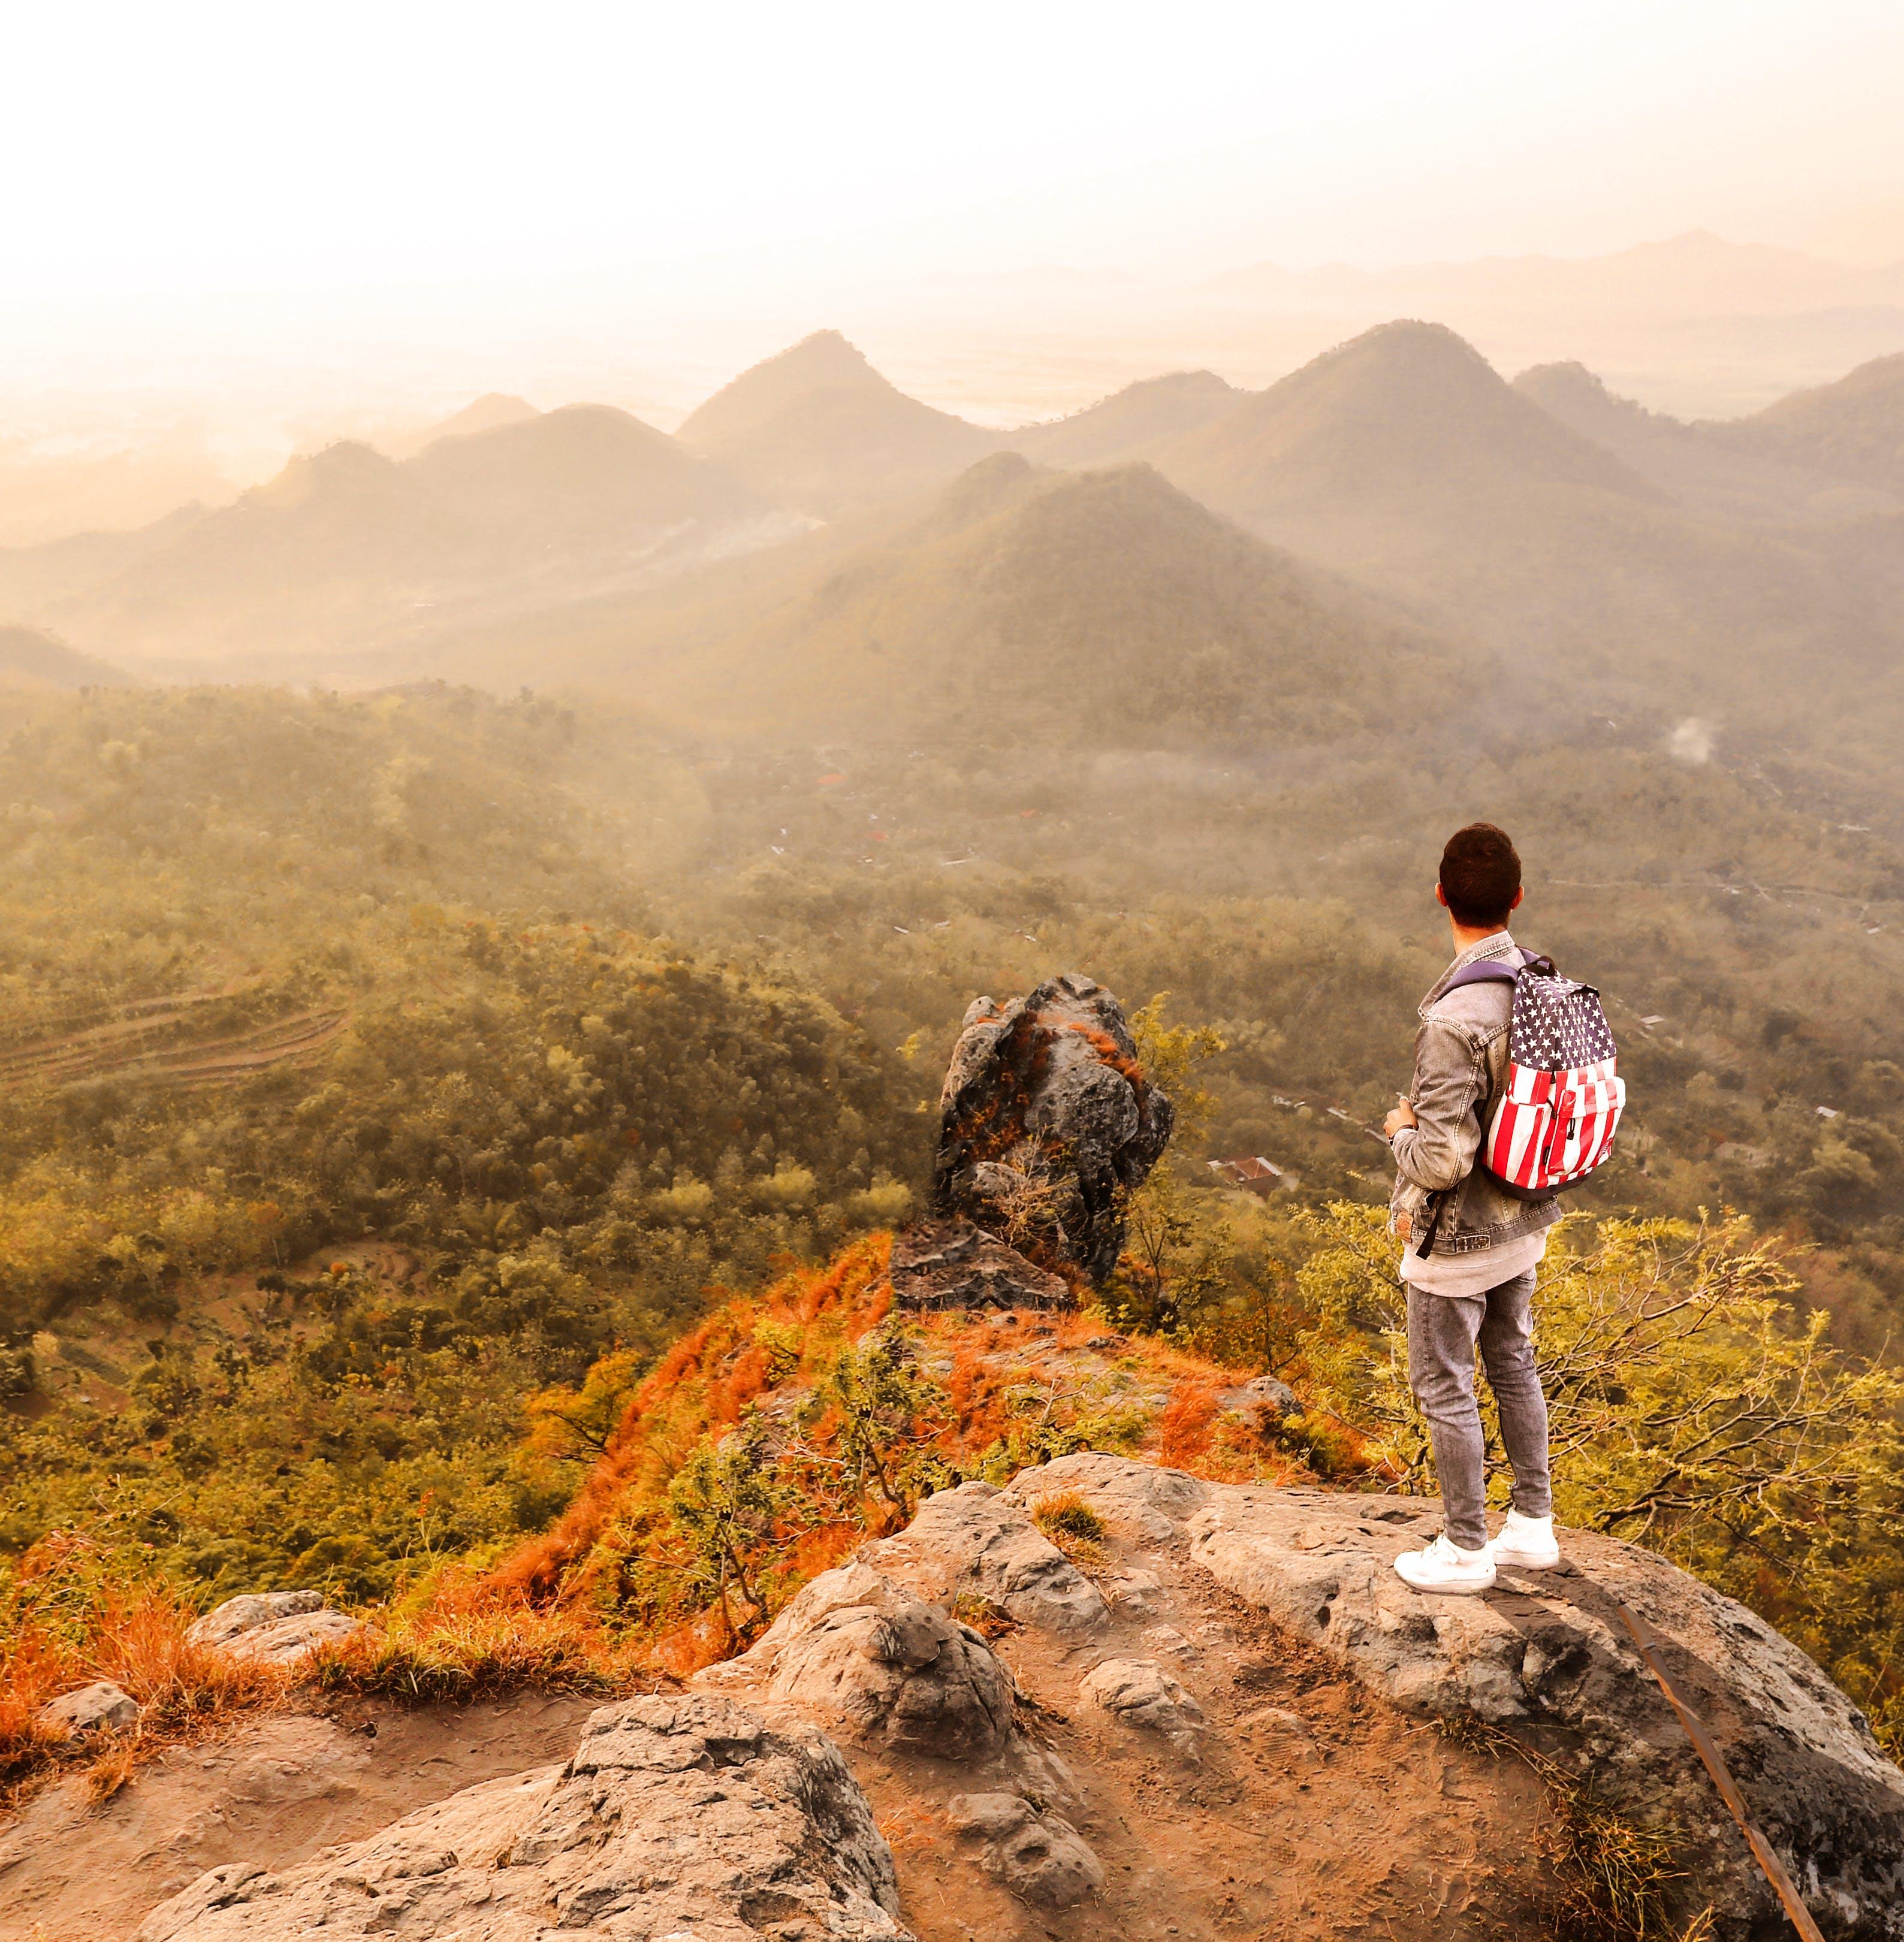 Man Standing on a Mountain Summit